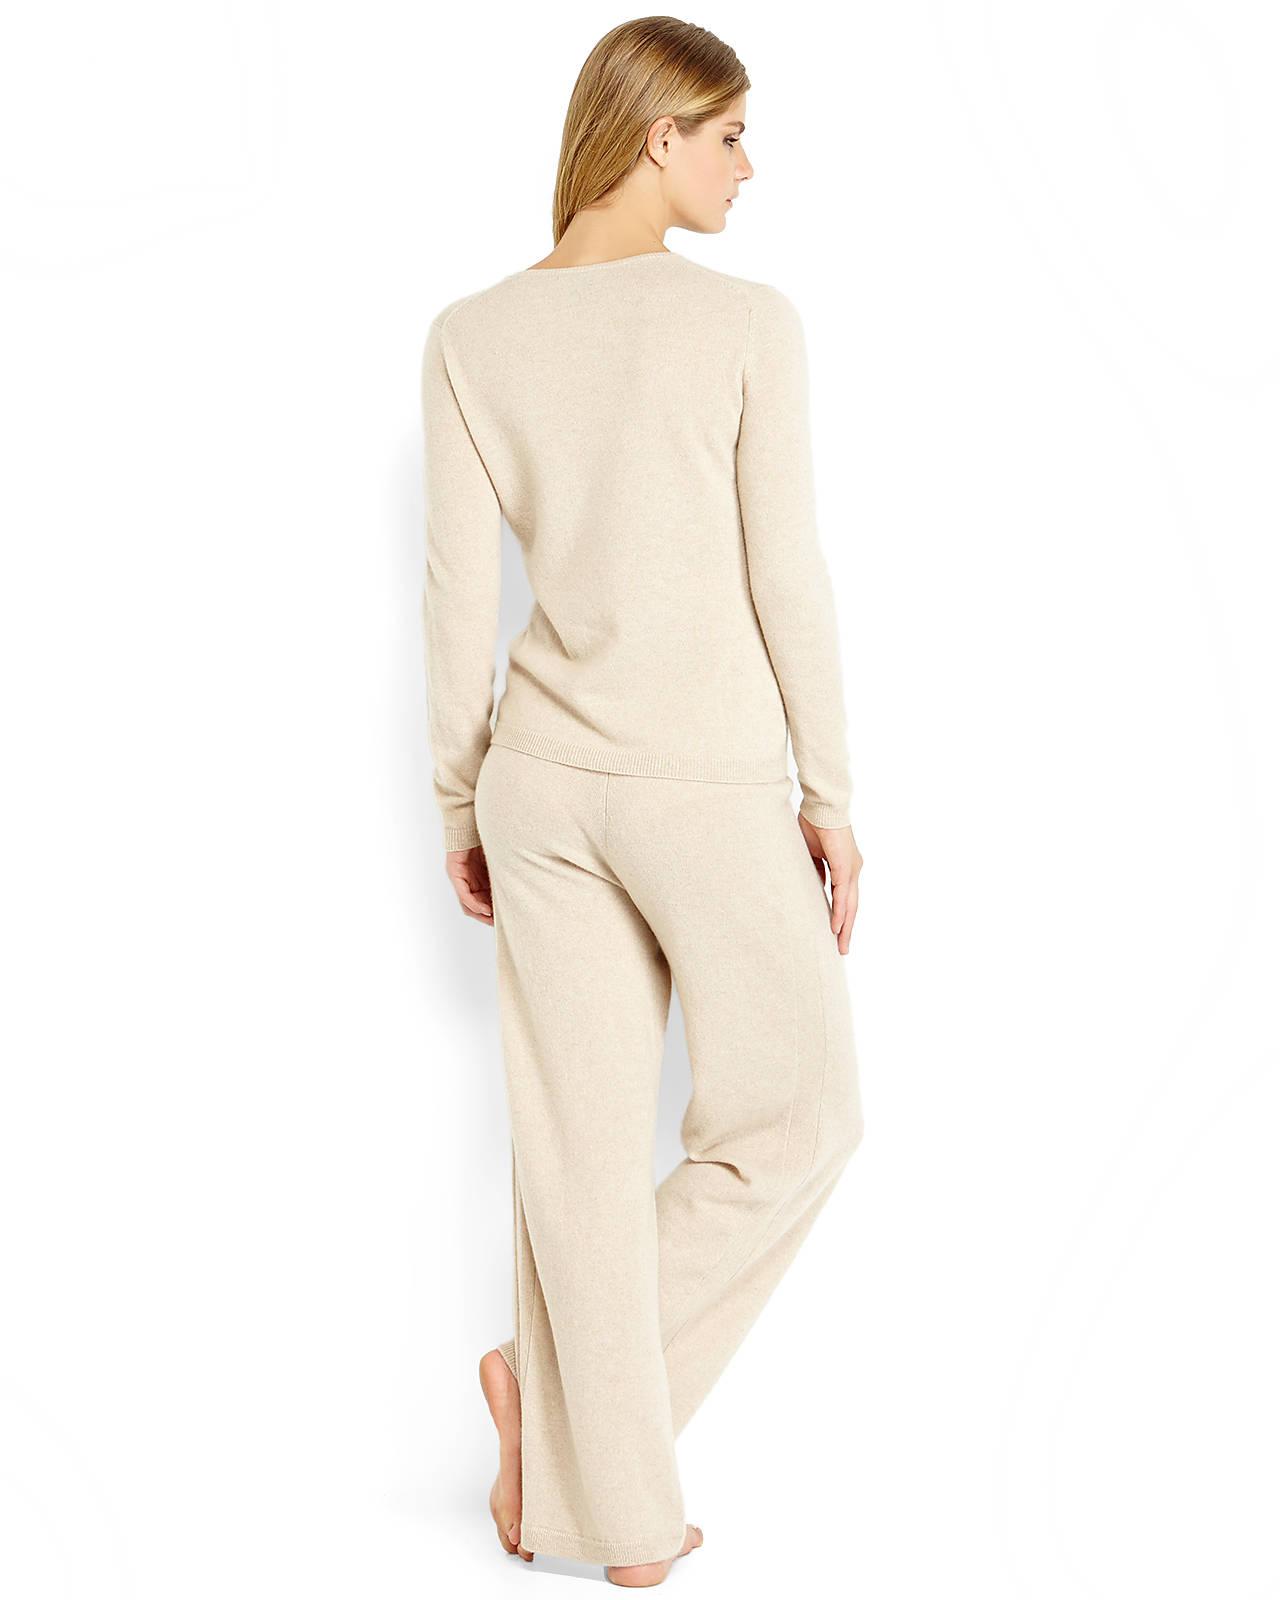 bbe287148d Sofia Cashmere Two-Piece Beige Knit Cashmere Top & Pant Set in ...